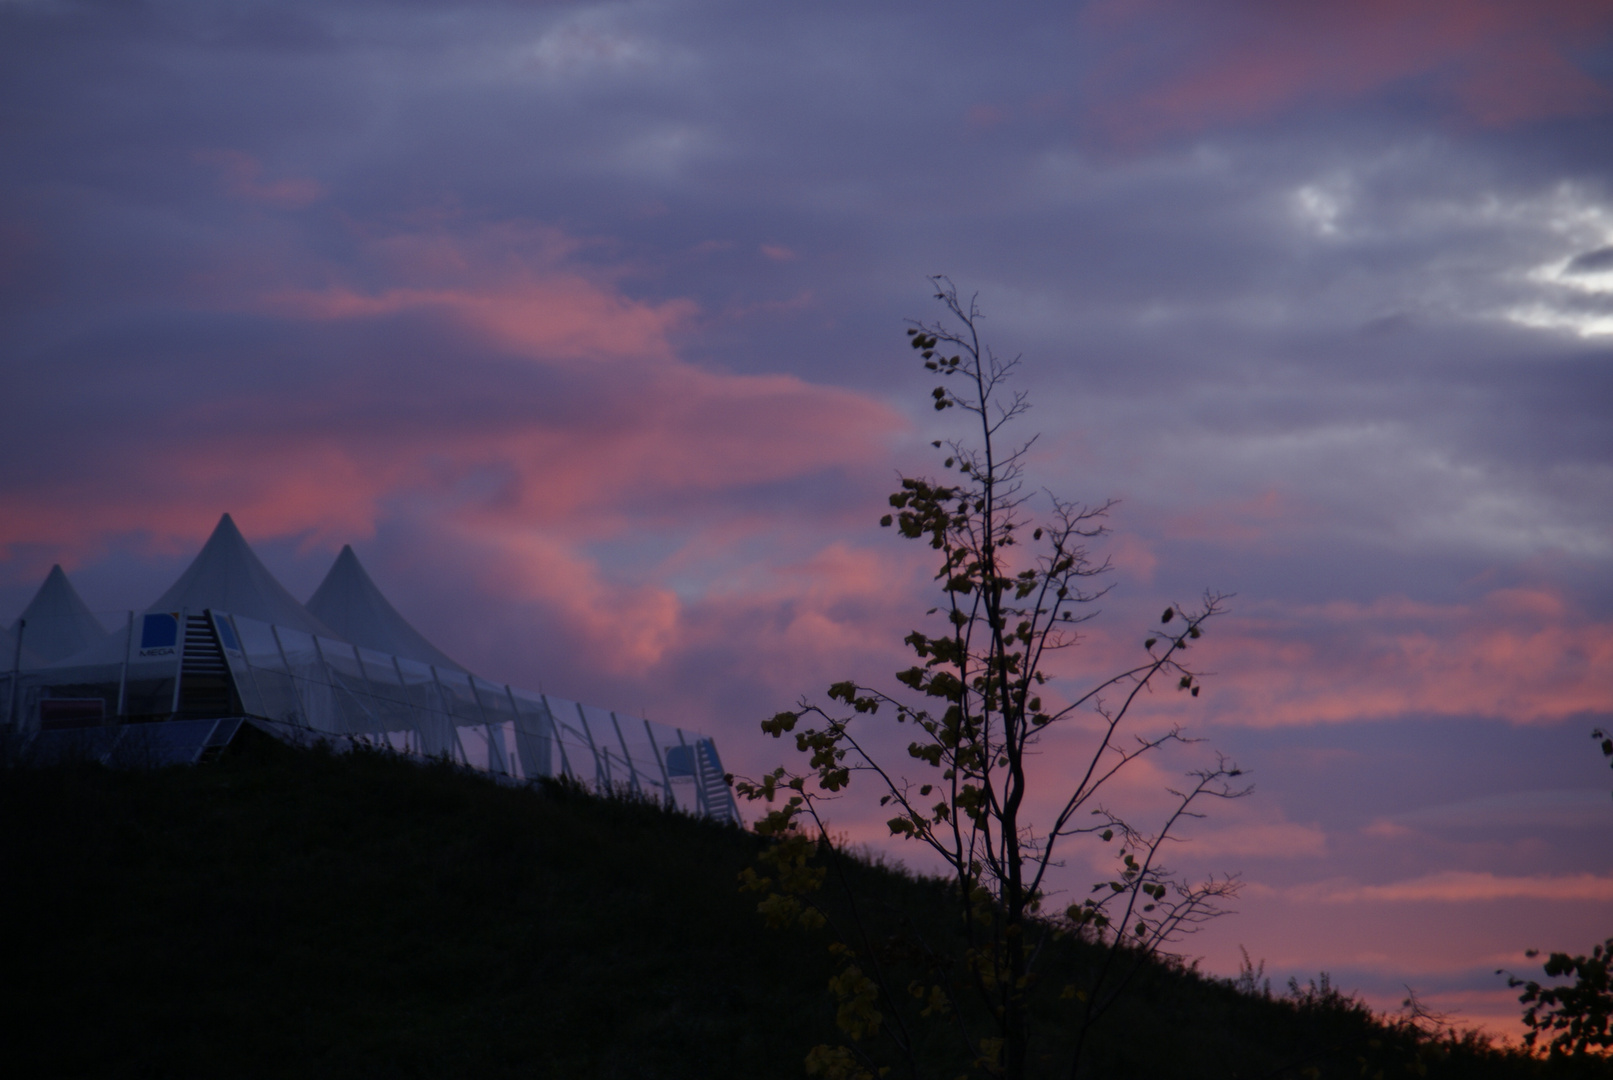 Sonnenaufgang am Monberg in Monheim am Rhein